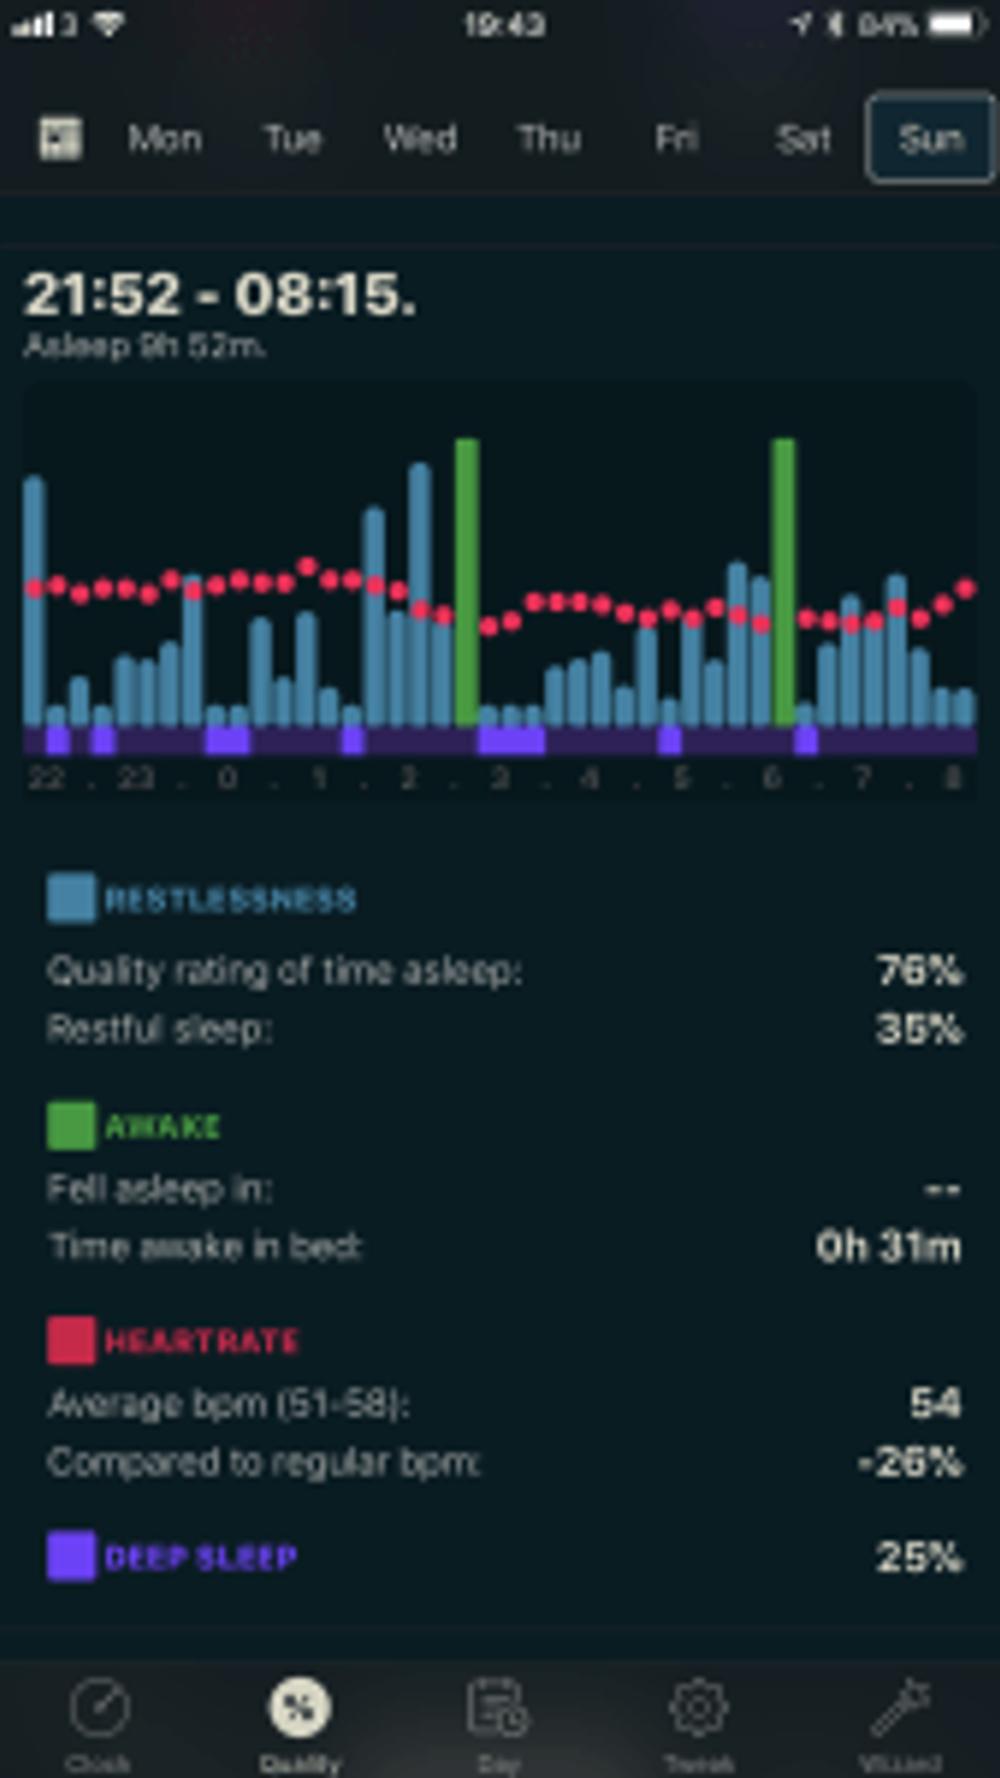 Sleep tracking Data Clearly displayed